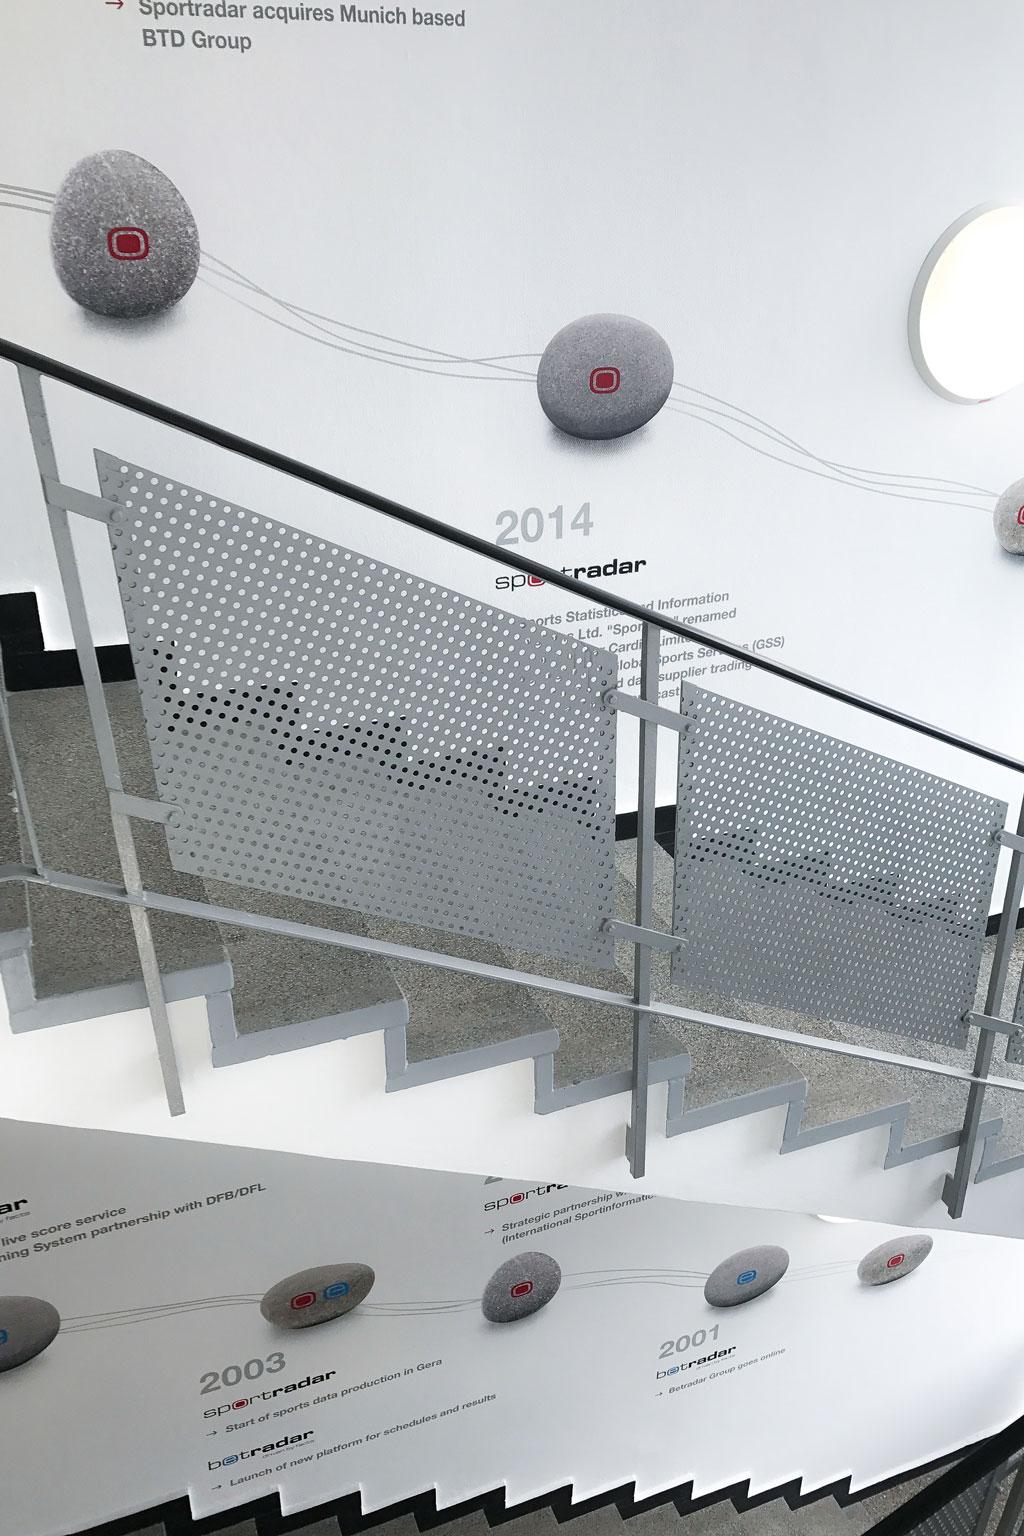 folien-fabrik / Sportradar AG / Staircase Branding